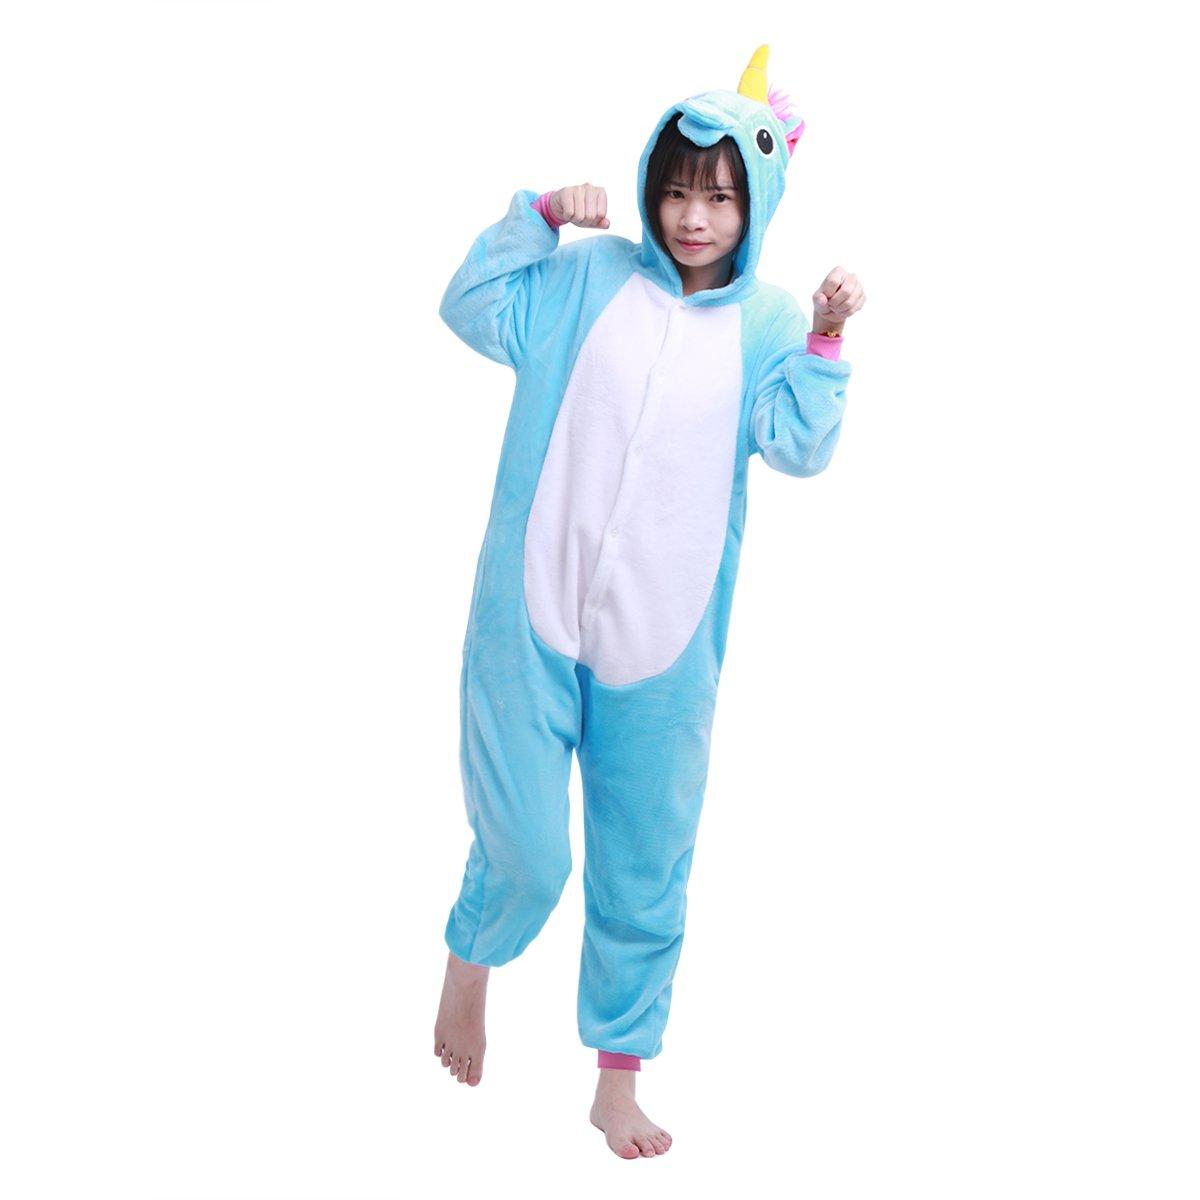 Amazon.com: iEFiEL Kids Boy Girls Cute Unicorn Pajamas Costume Animal One-Piece Sleepwear Cosplay Costume: Clothing